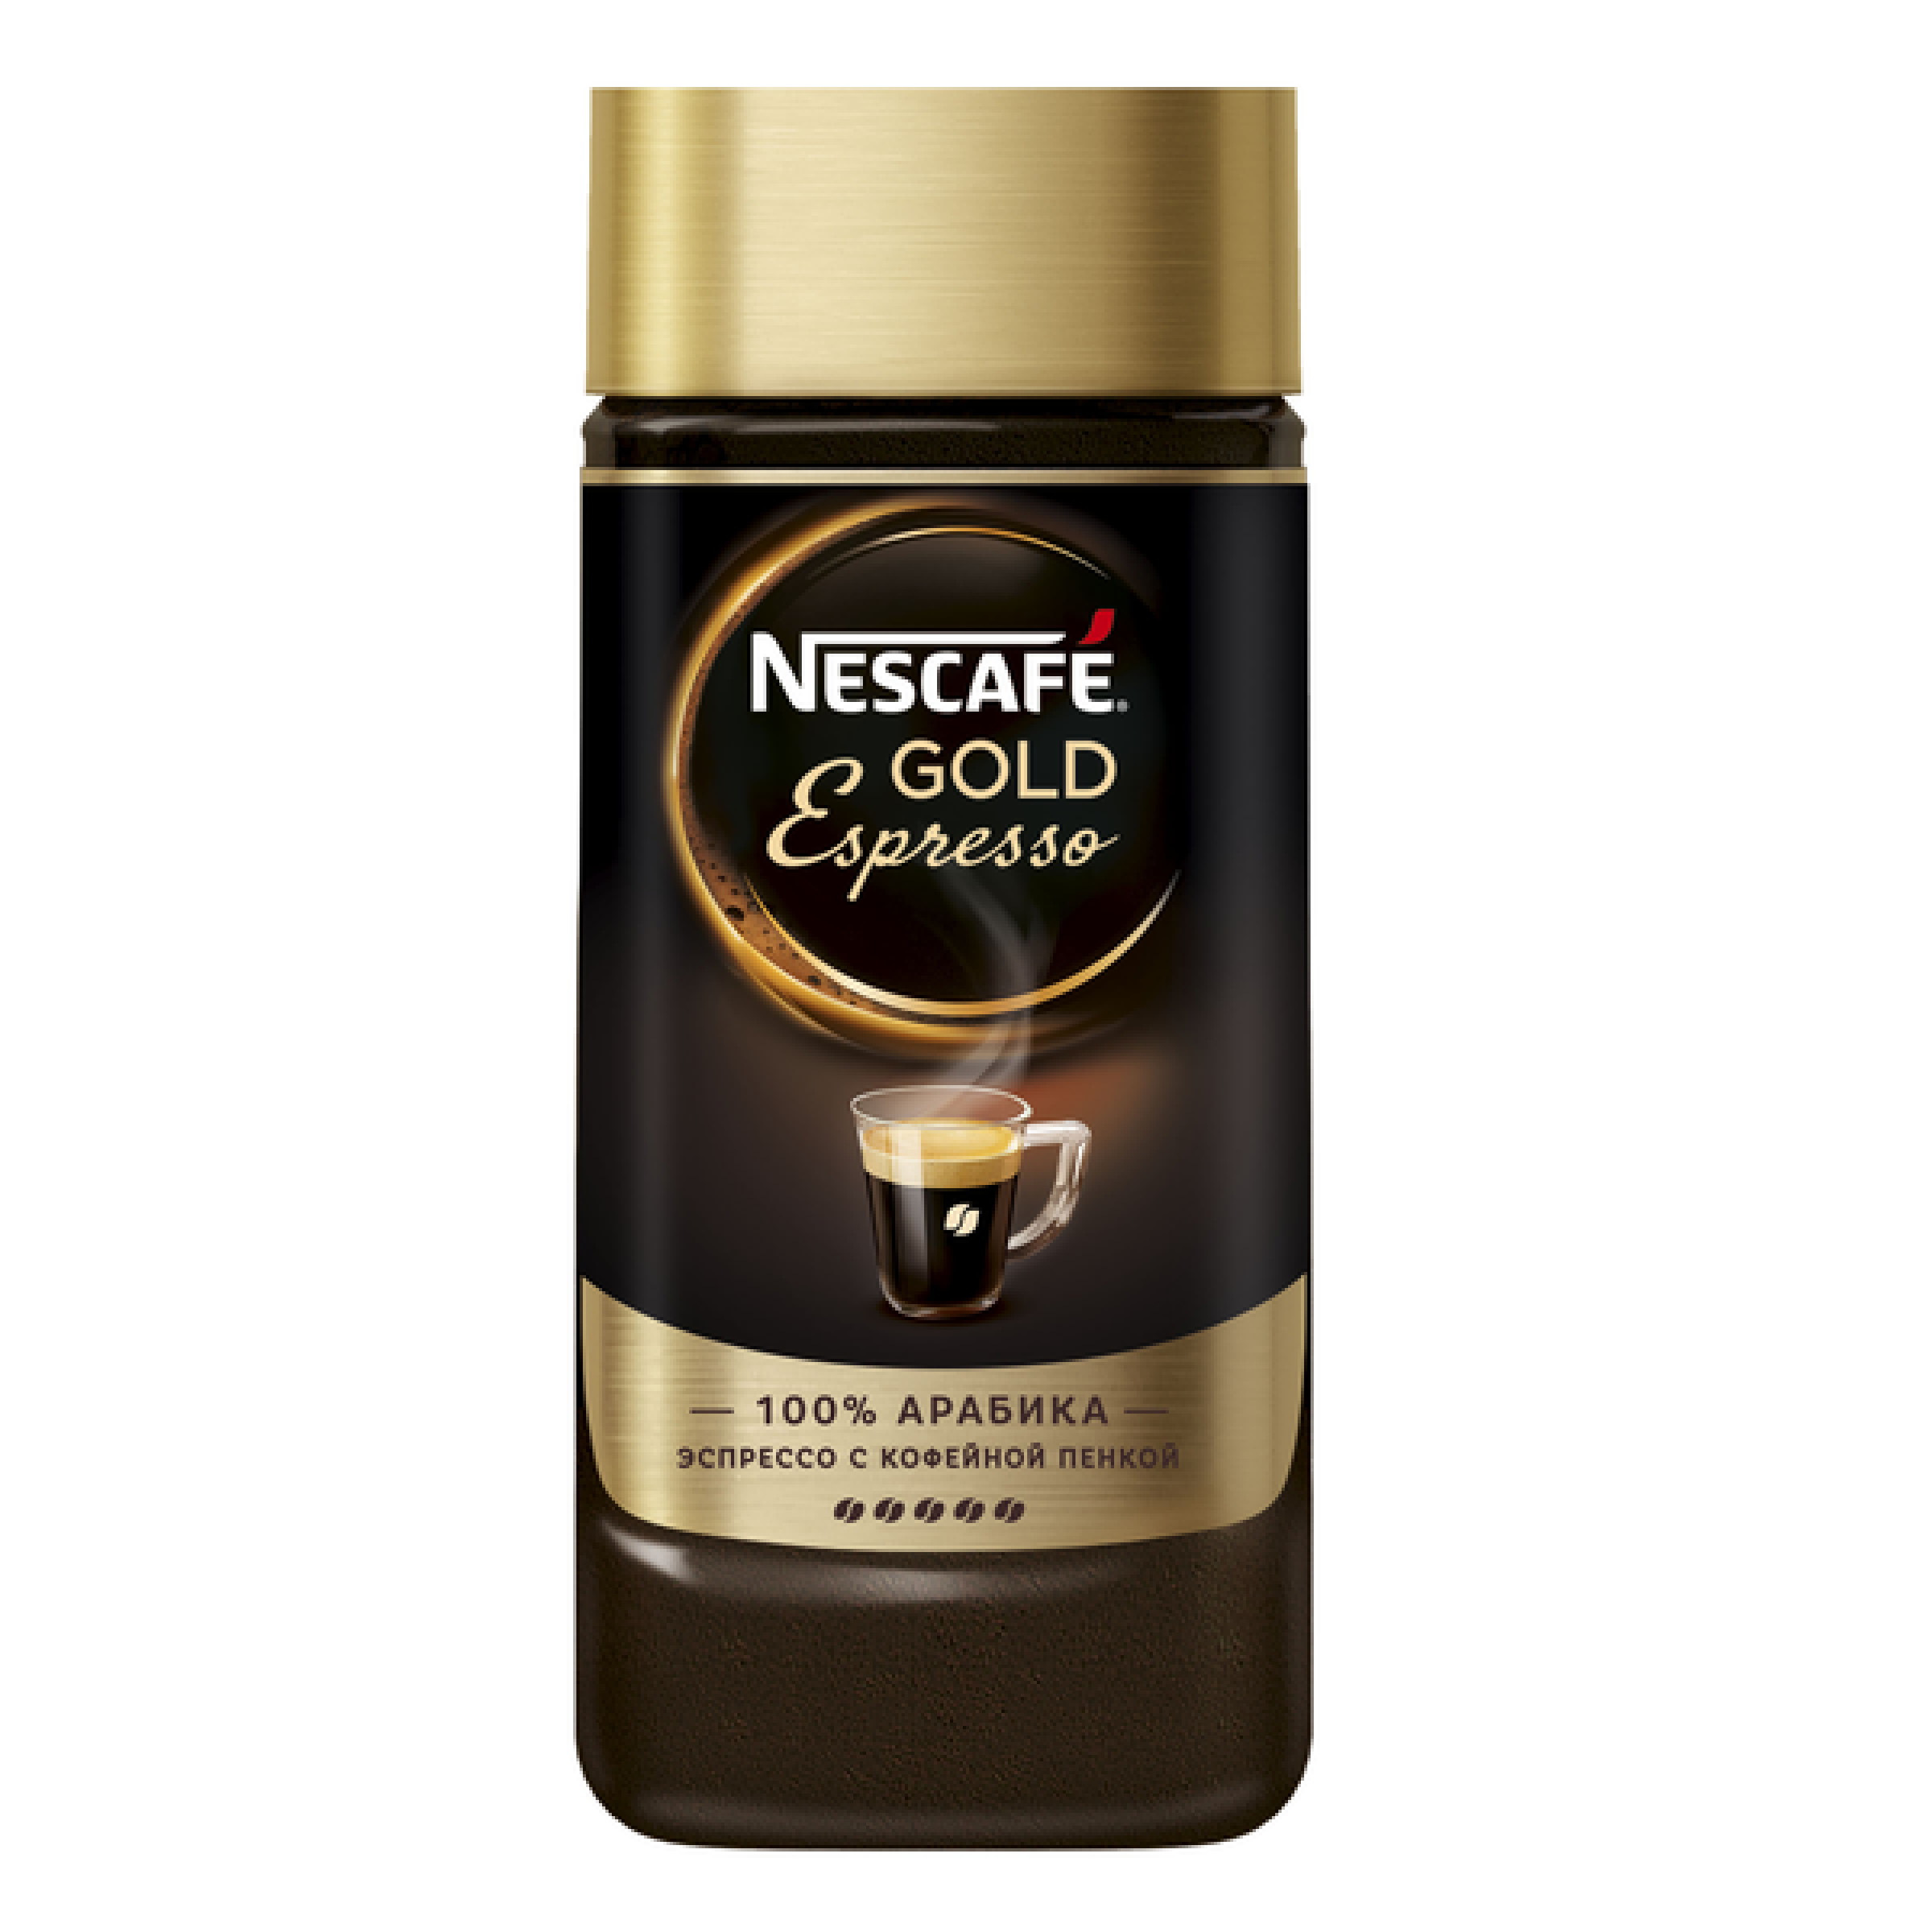 Кофе Nescafe Gold Espresso, 85г